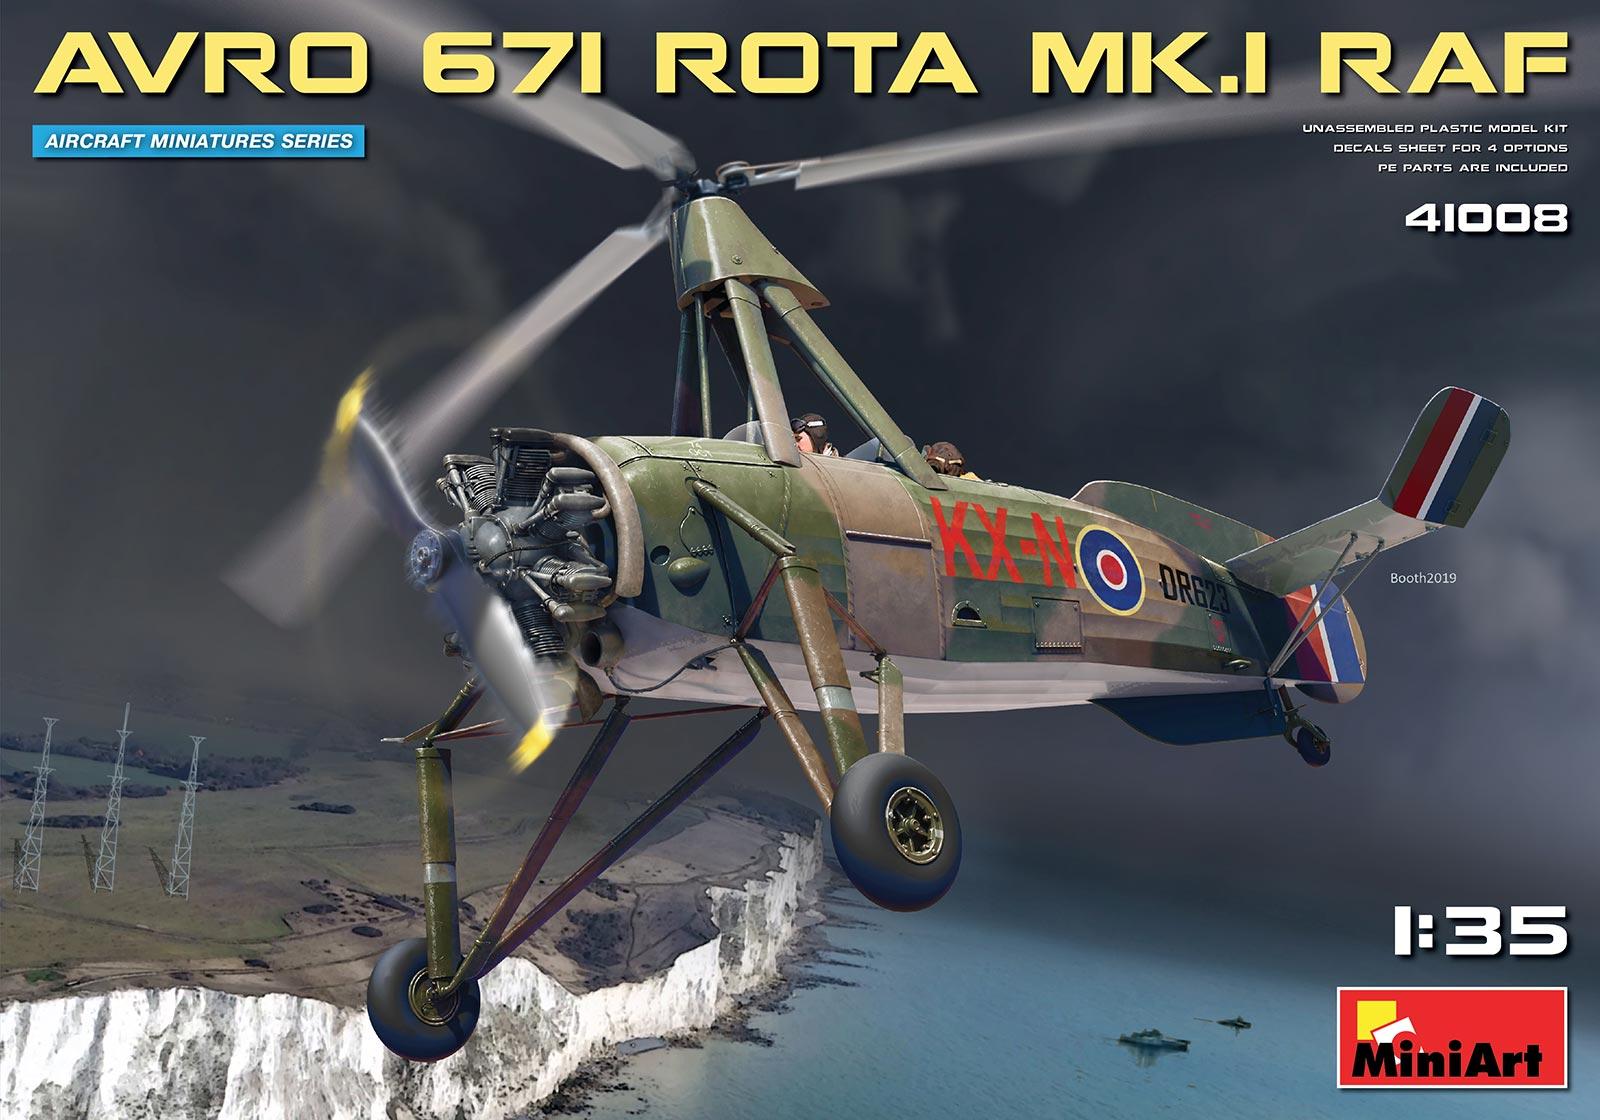 MiniArt Avro 671 Rota Mk.I RAF